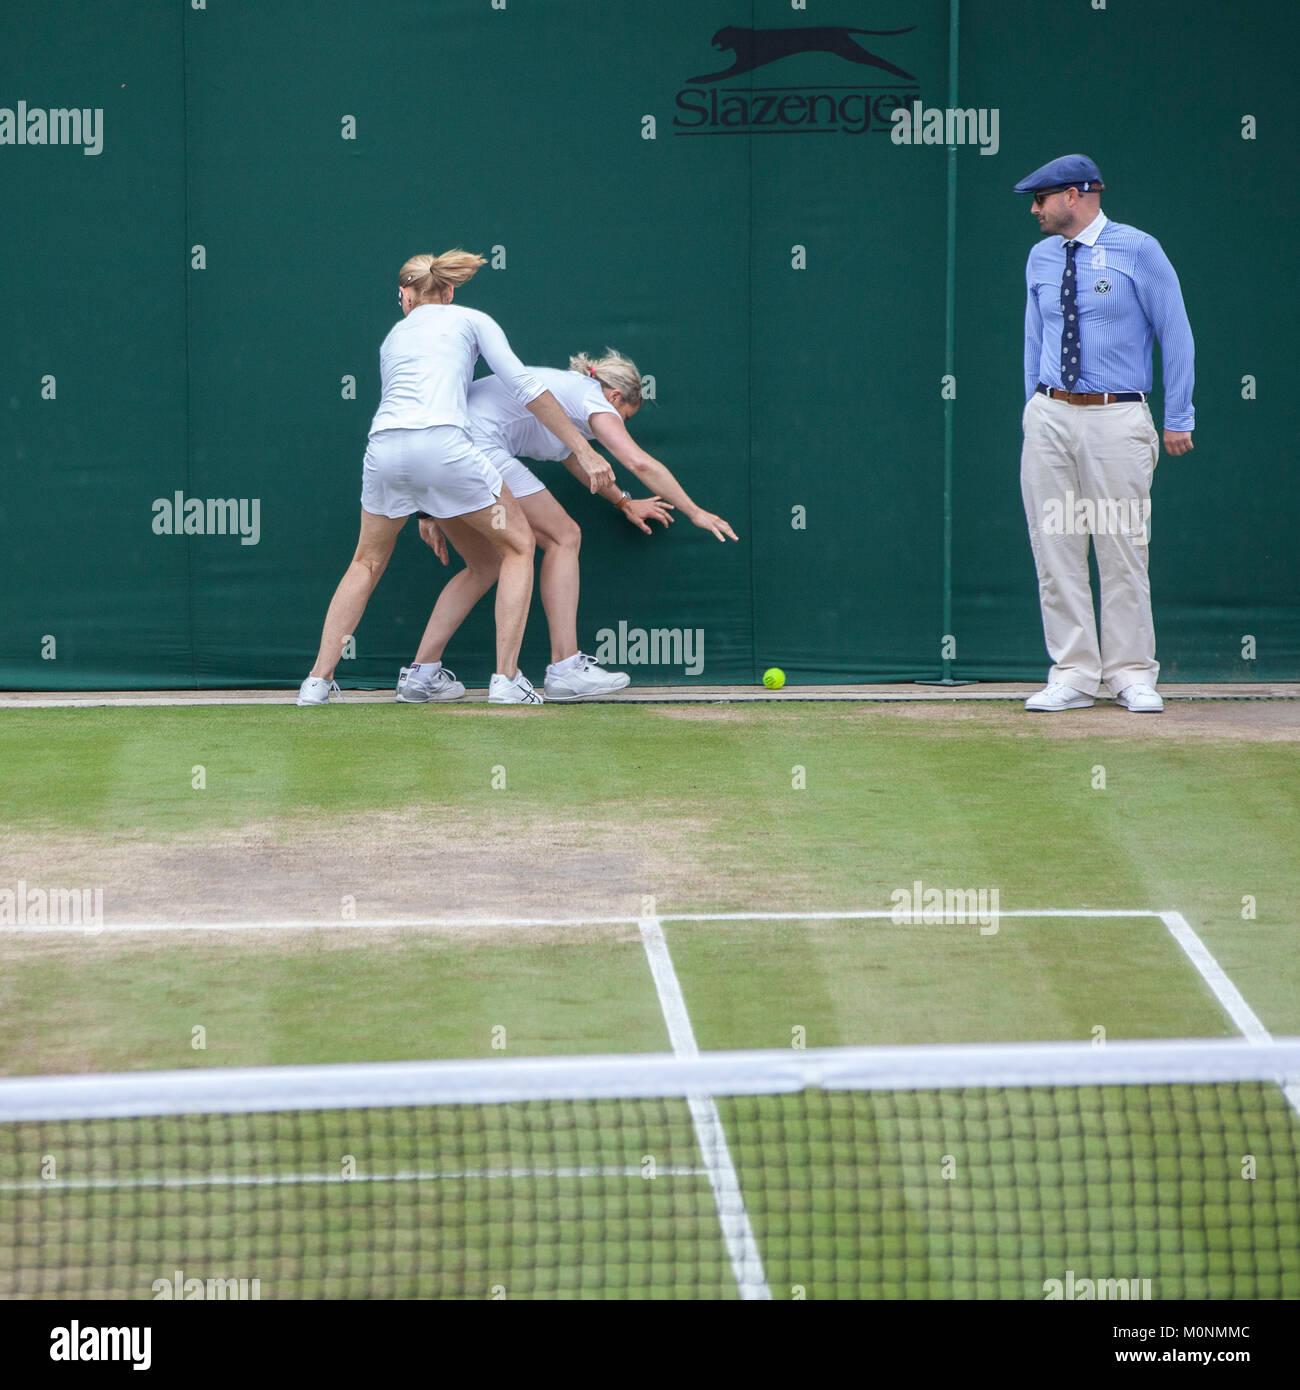 2017 Wimbledon Finals Brackets Back To The Future: Wimbledon Ball Girl Stock Photos & Wimbledon Ball Girl